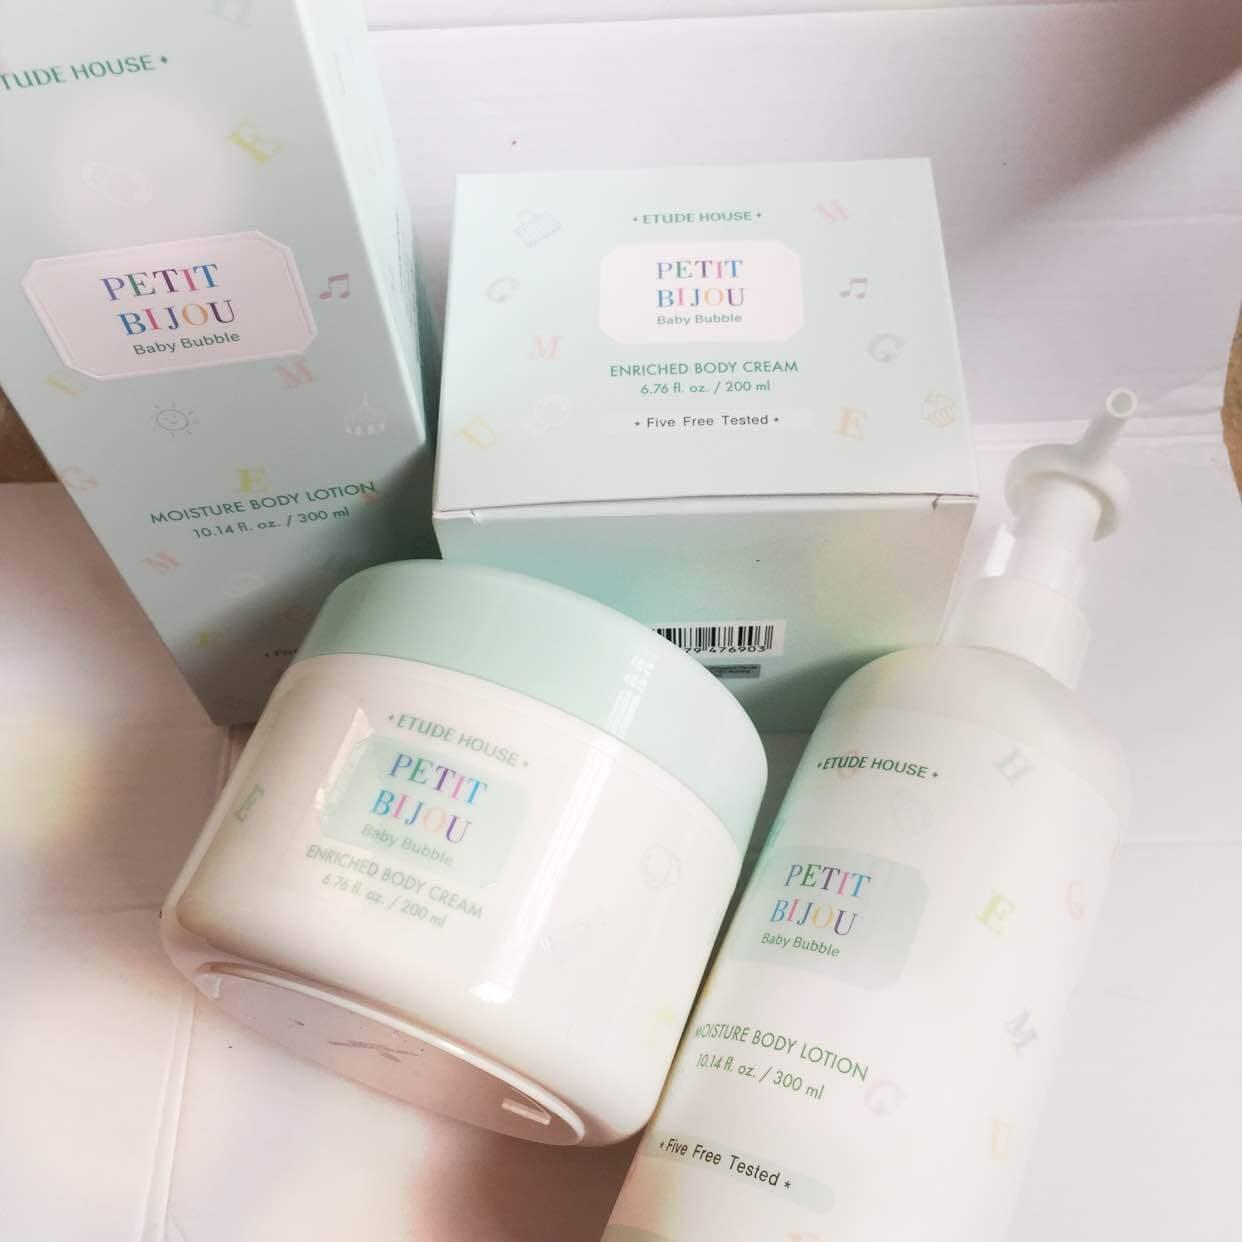 Kem dưỡng ETUDE HOUSE BODY Petit Bijou Enriched Body Cream